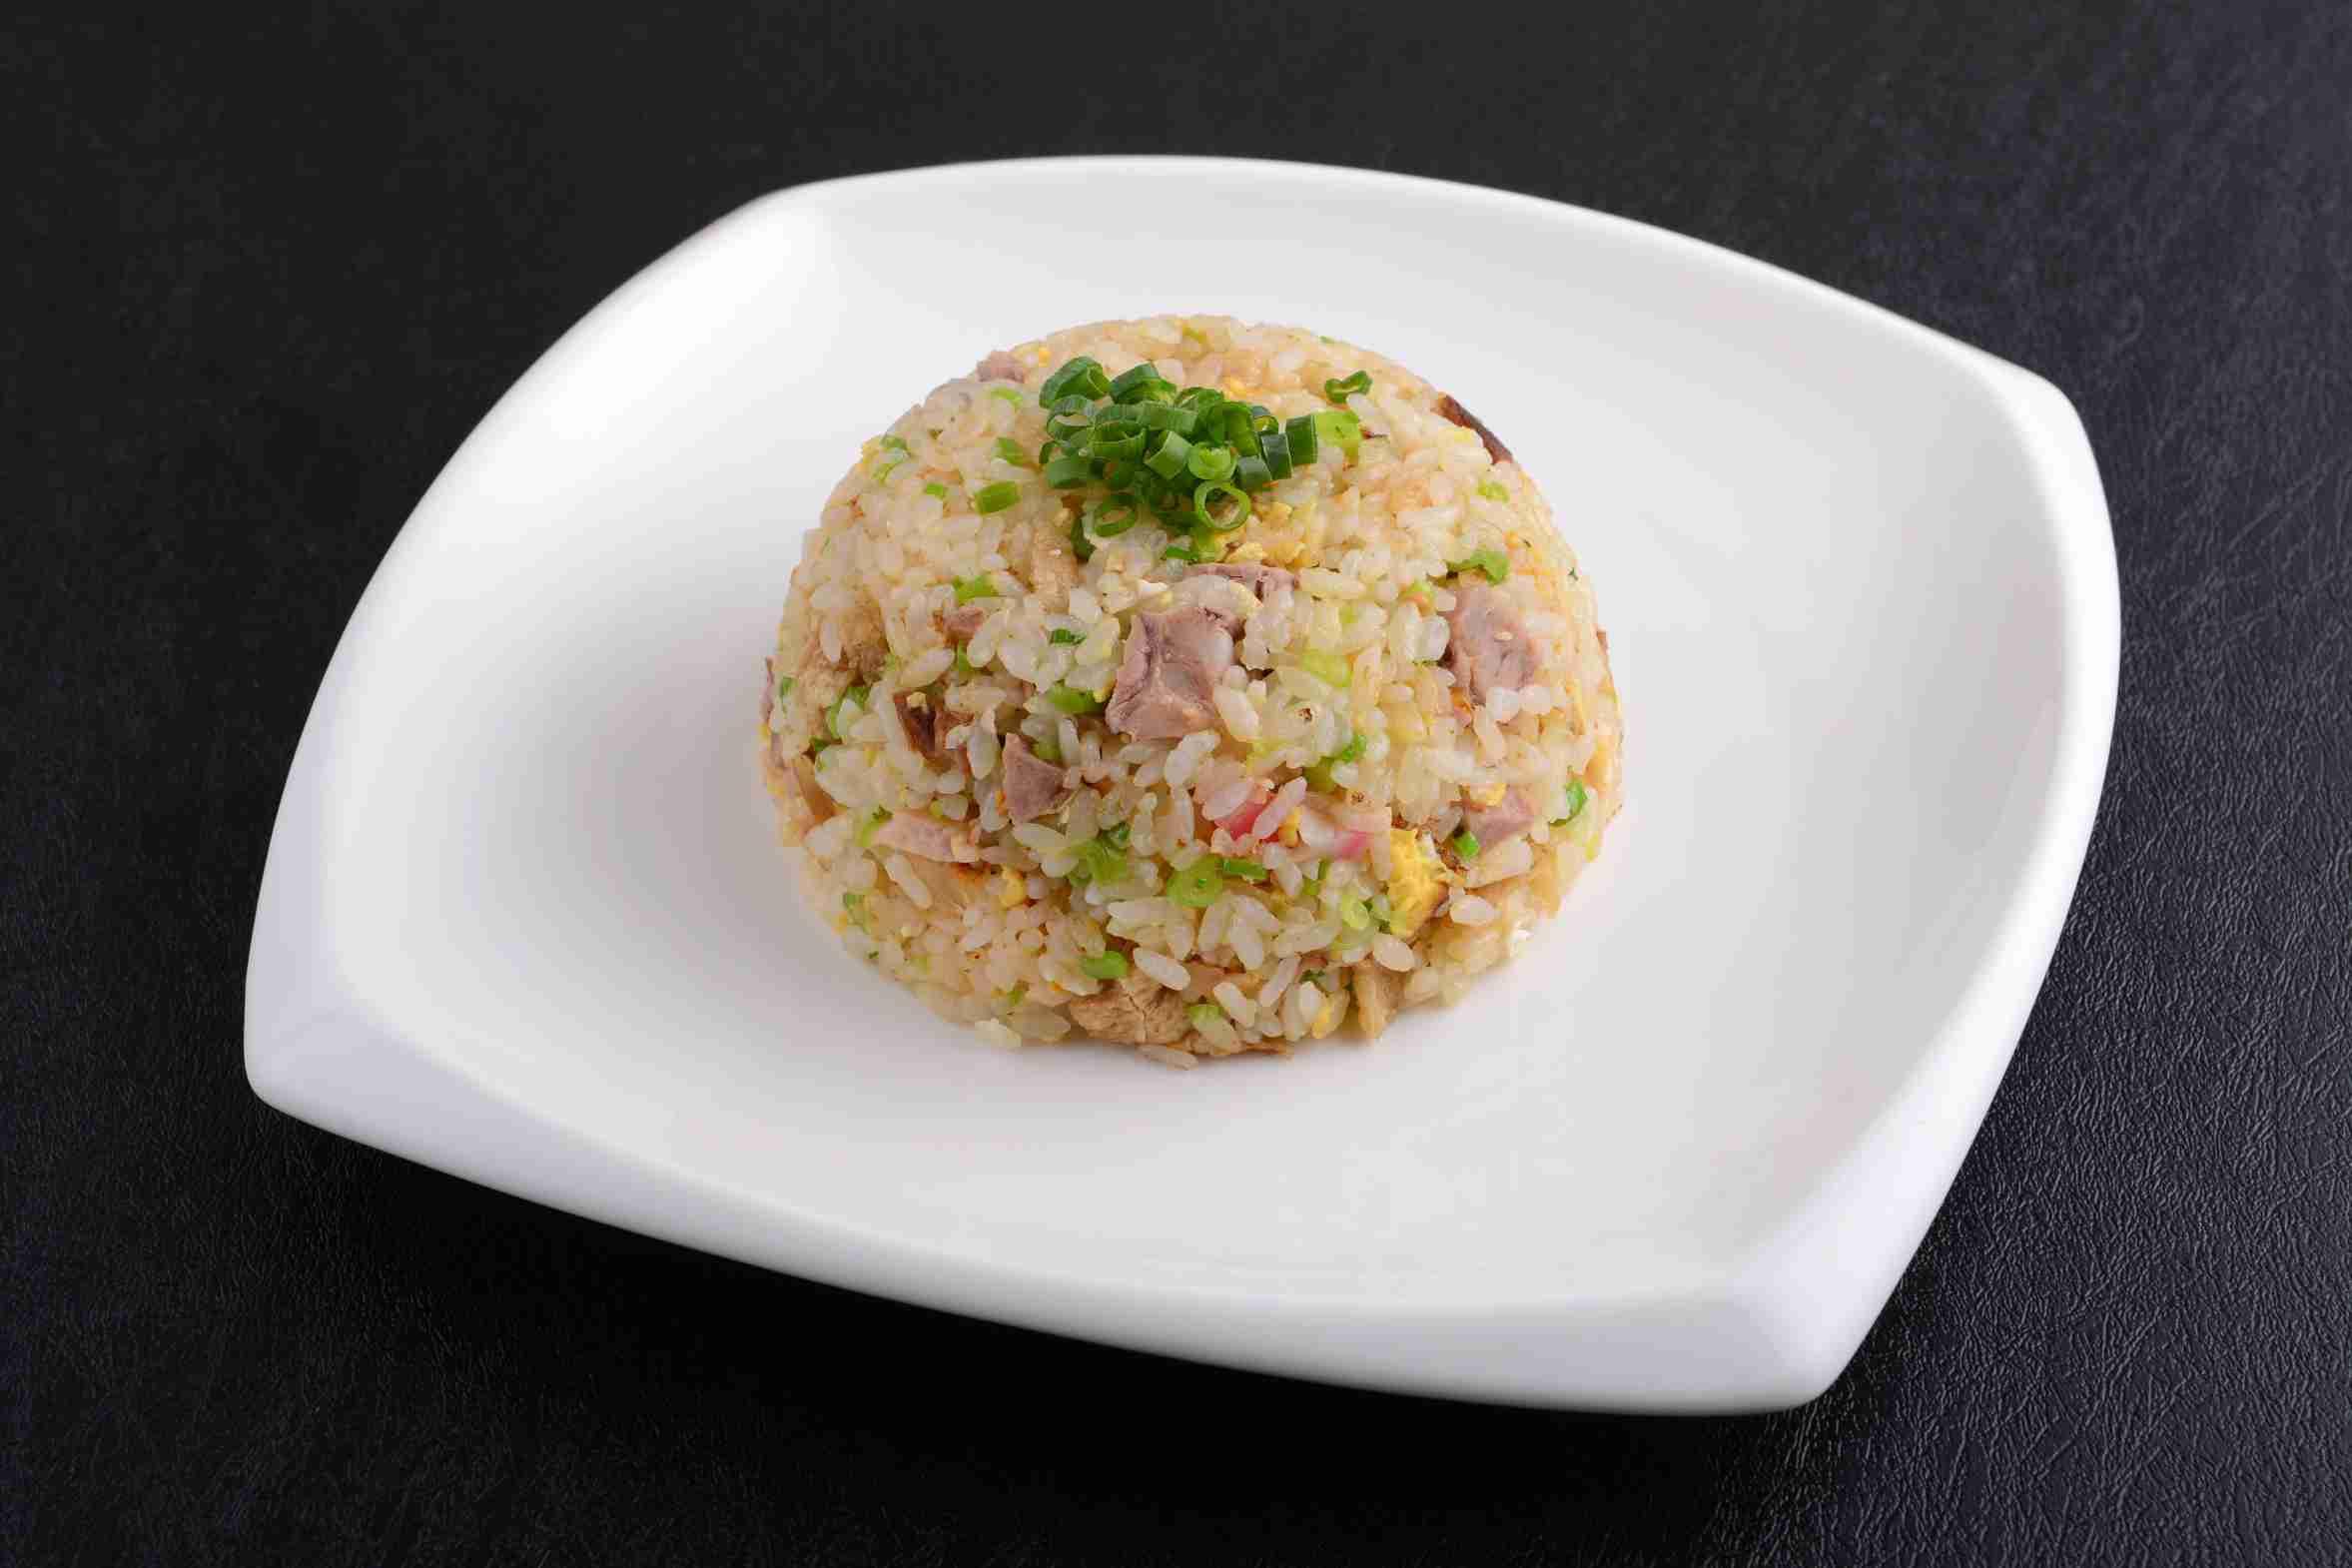 Fried Rice ($8.00)